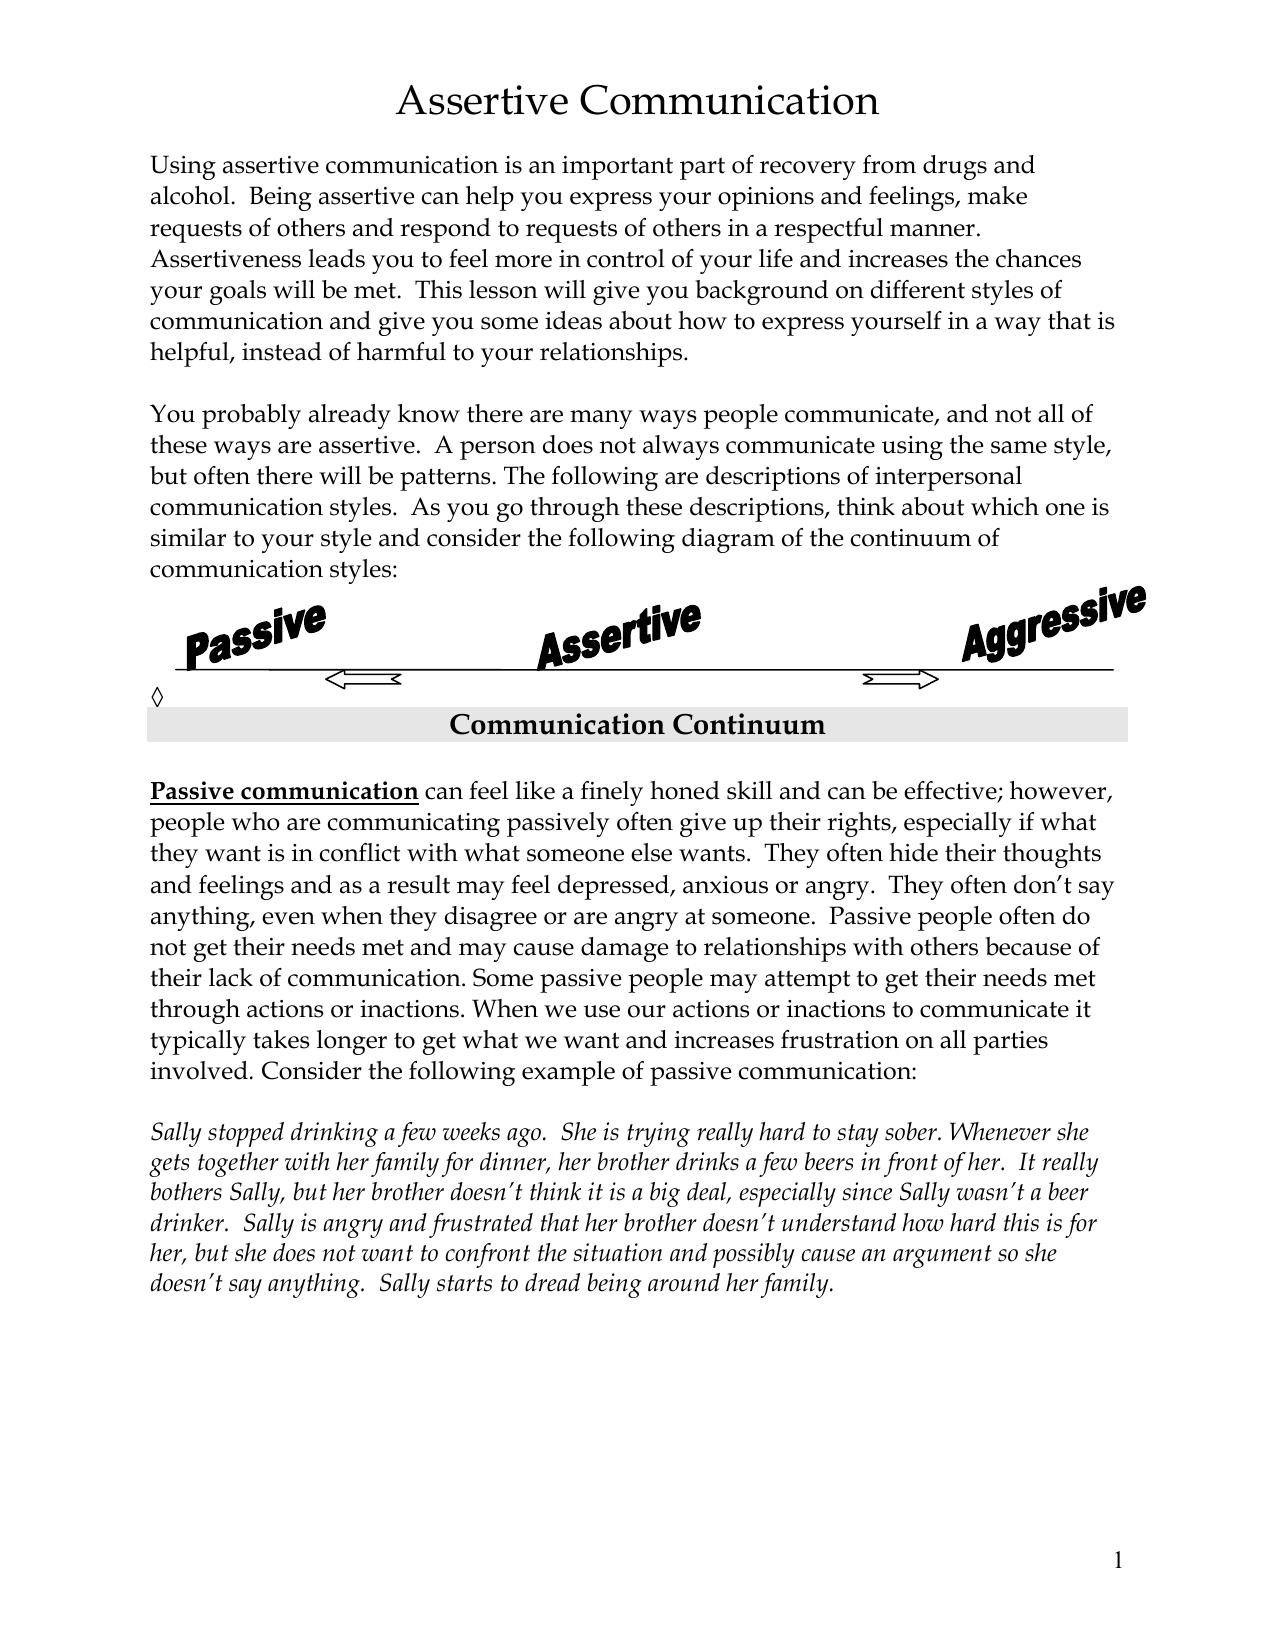 Assertive Communication Worksheet